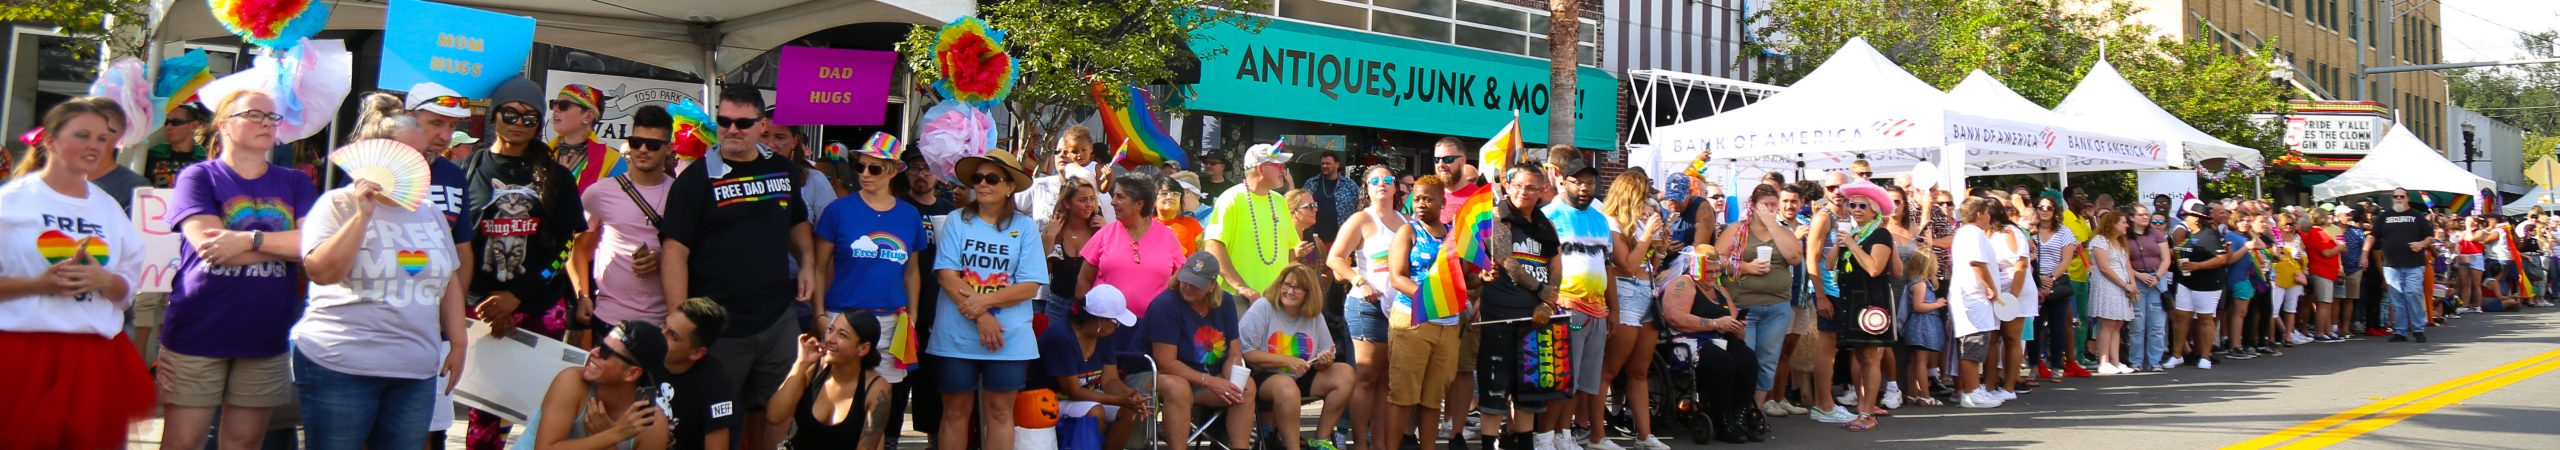 River City Pride Parade 2019